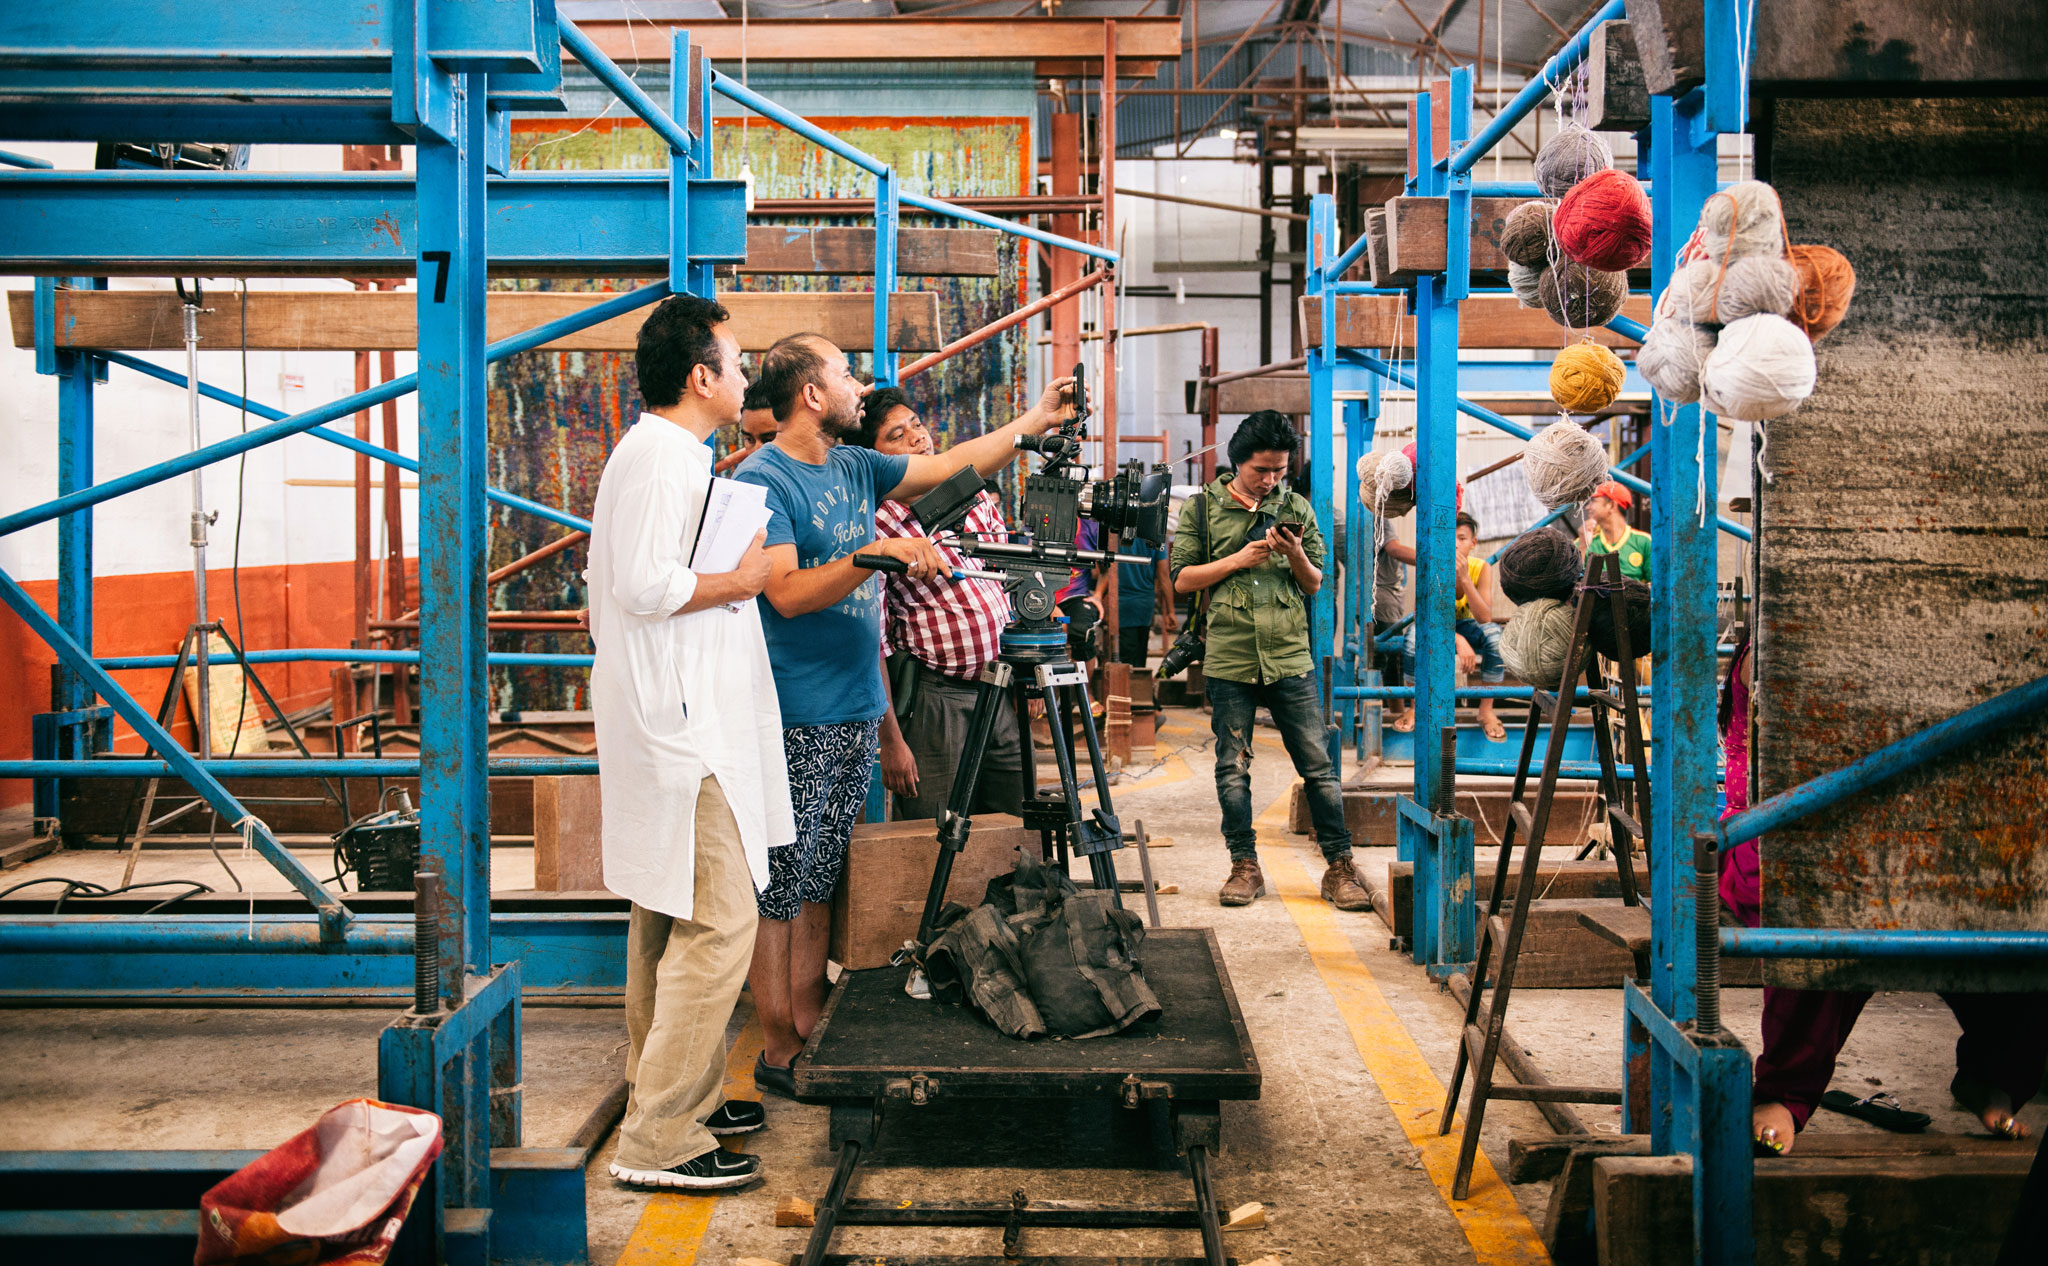 Director Tsering Rhitar Sherpa (left) readies for filming of a weaving scene in 'Nine Million Stars.' | Image courtesy of Jan Kath.